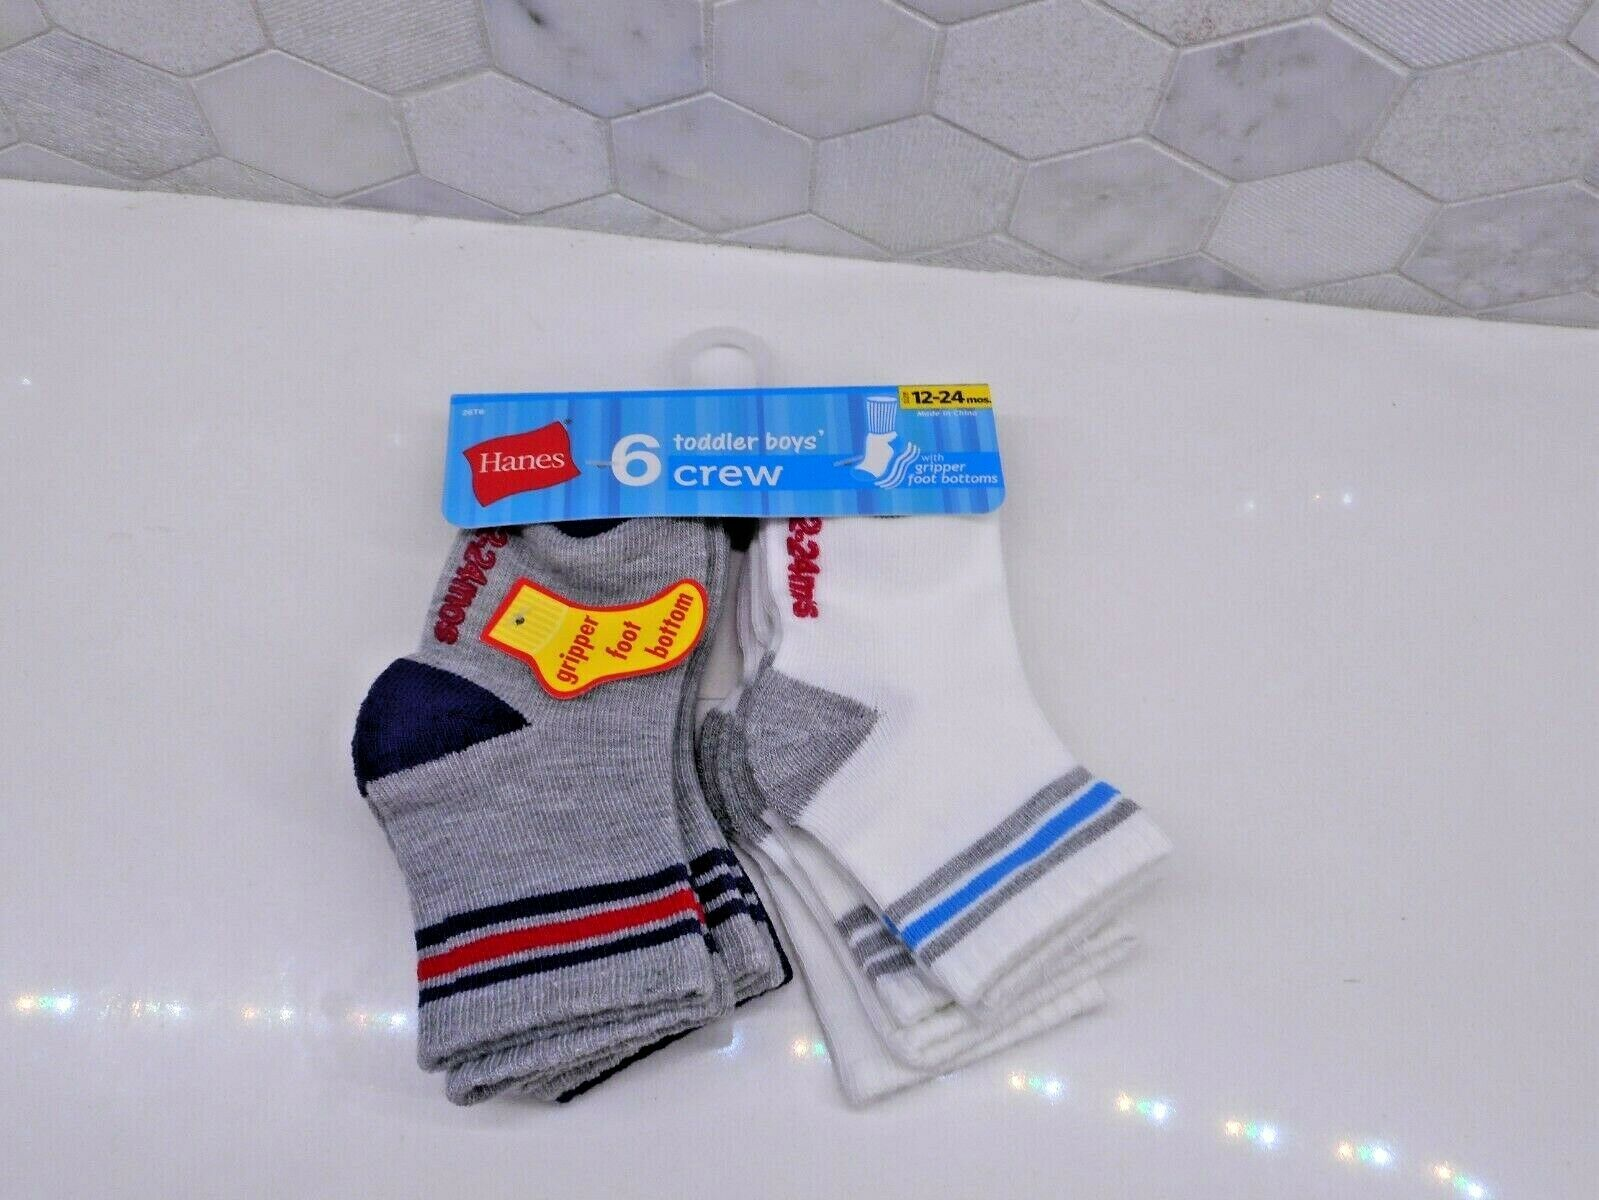 Hanes Toddler Boys 6-Pack Crew Socks, Assorted,12-24 Months